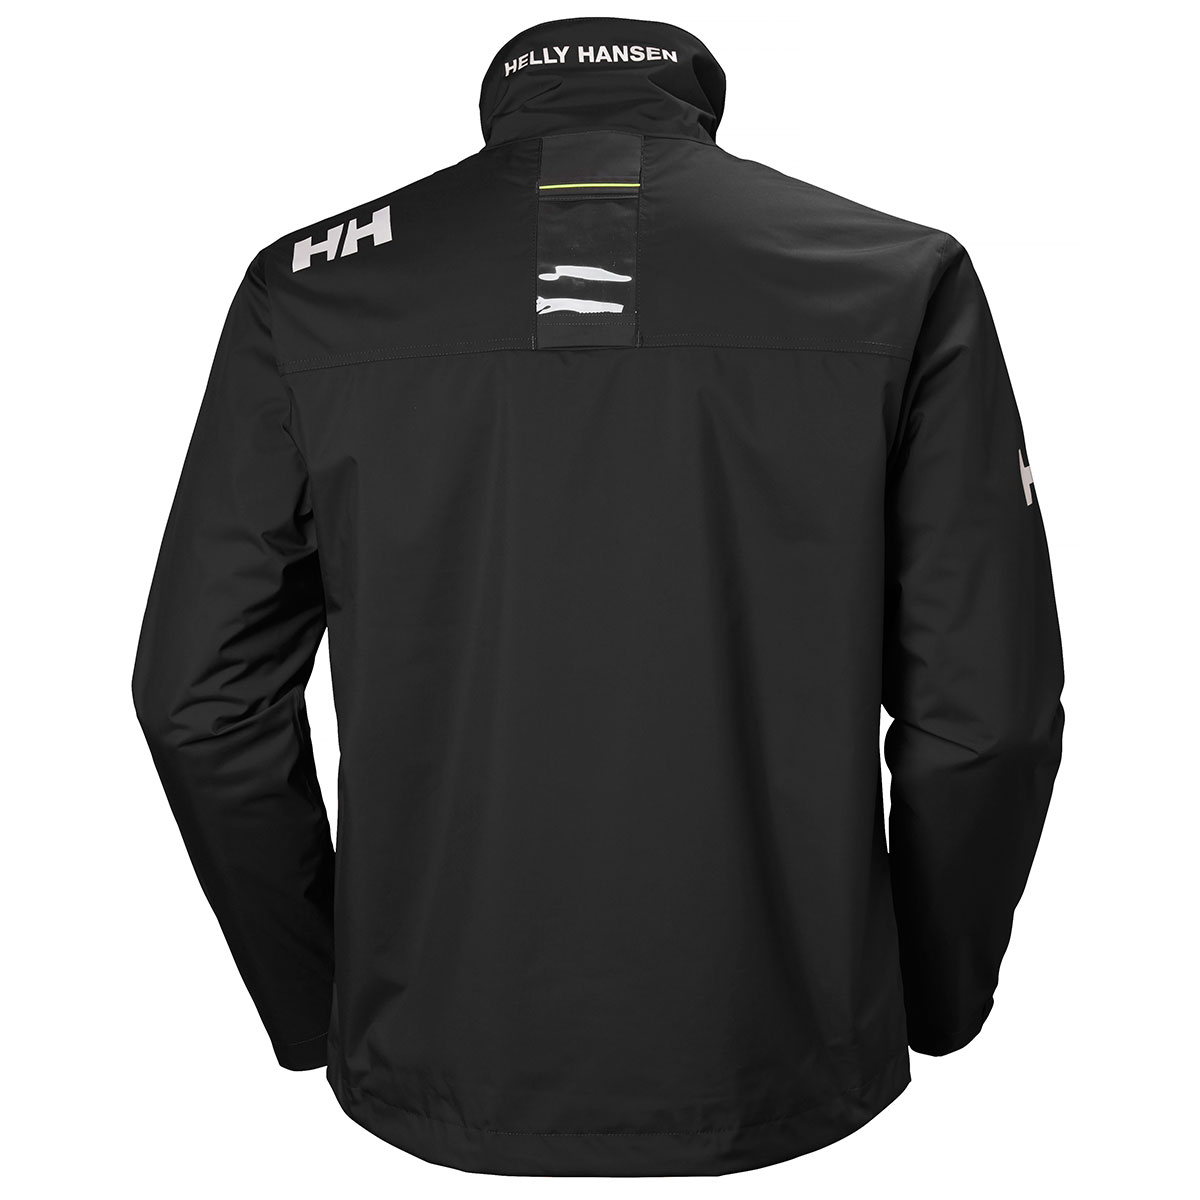 Helly-Hansen-Mens-2019-Crew-Midlayer-Waterproof-Windproof-Adjustable-Jacket thumbnail 3